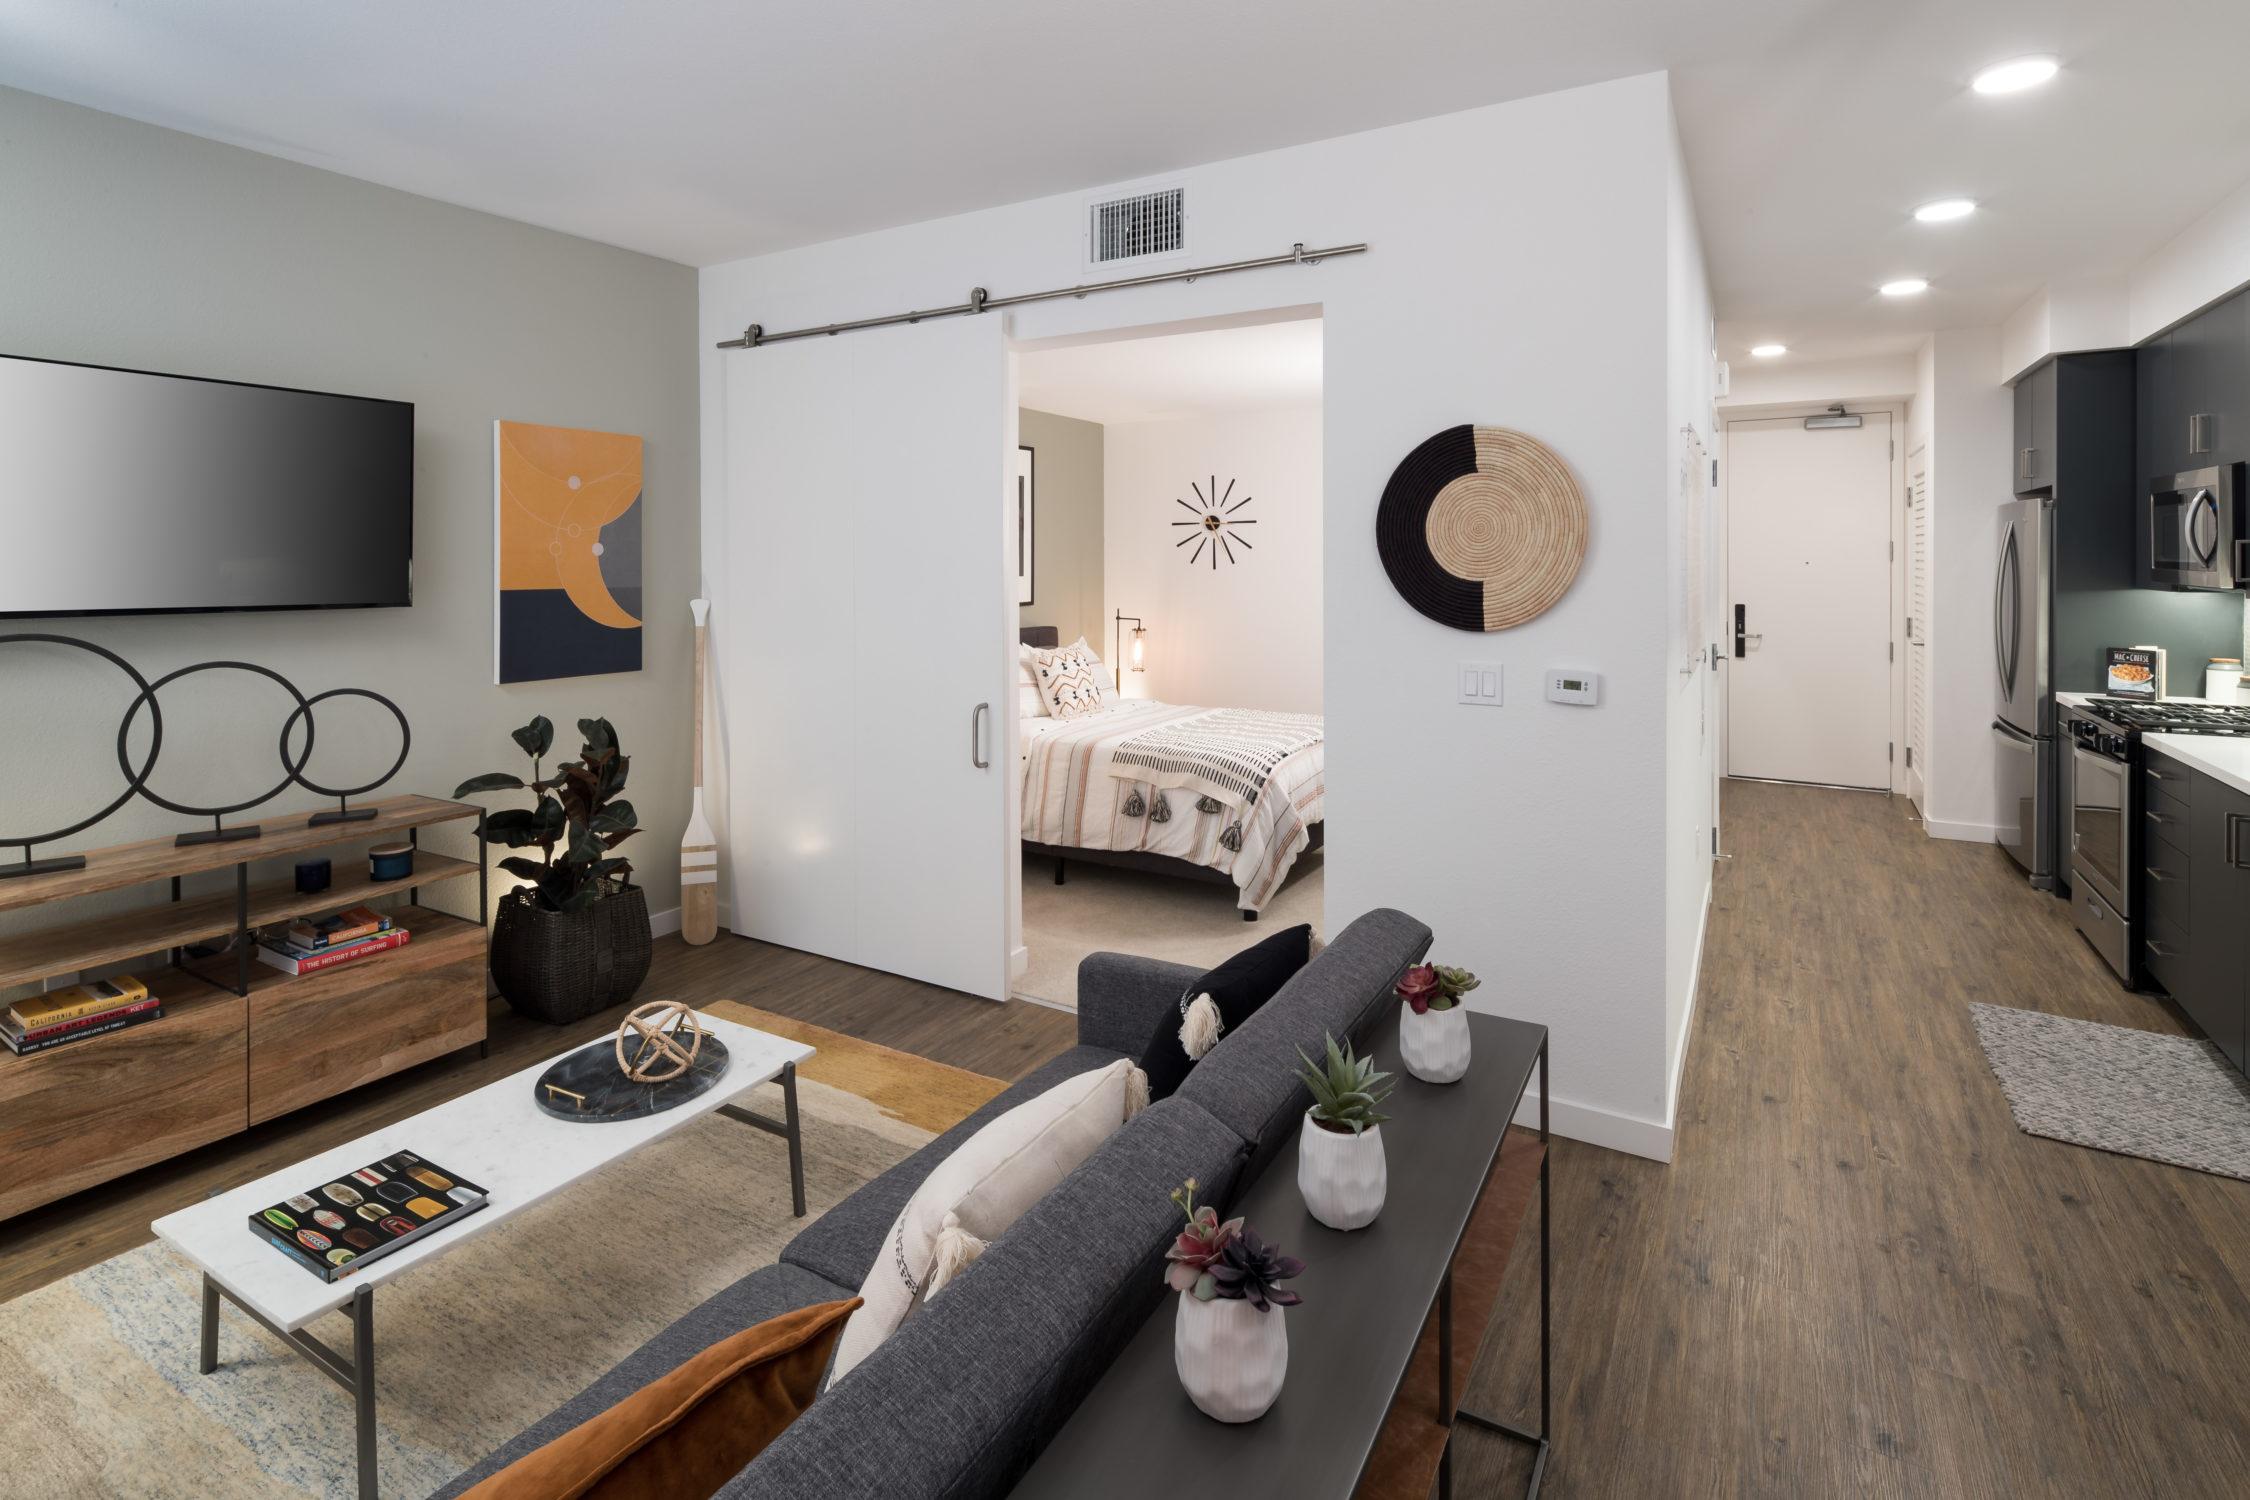 INT 06 One Bedroom Interior Living Bedroom Kitchen Views TCRA 4193 040